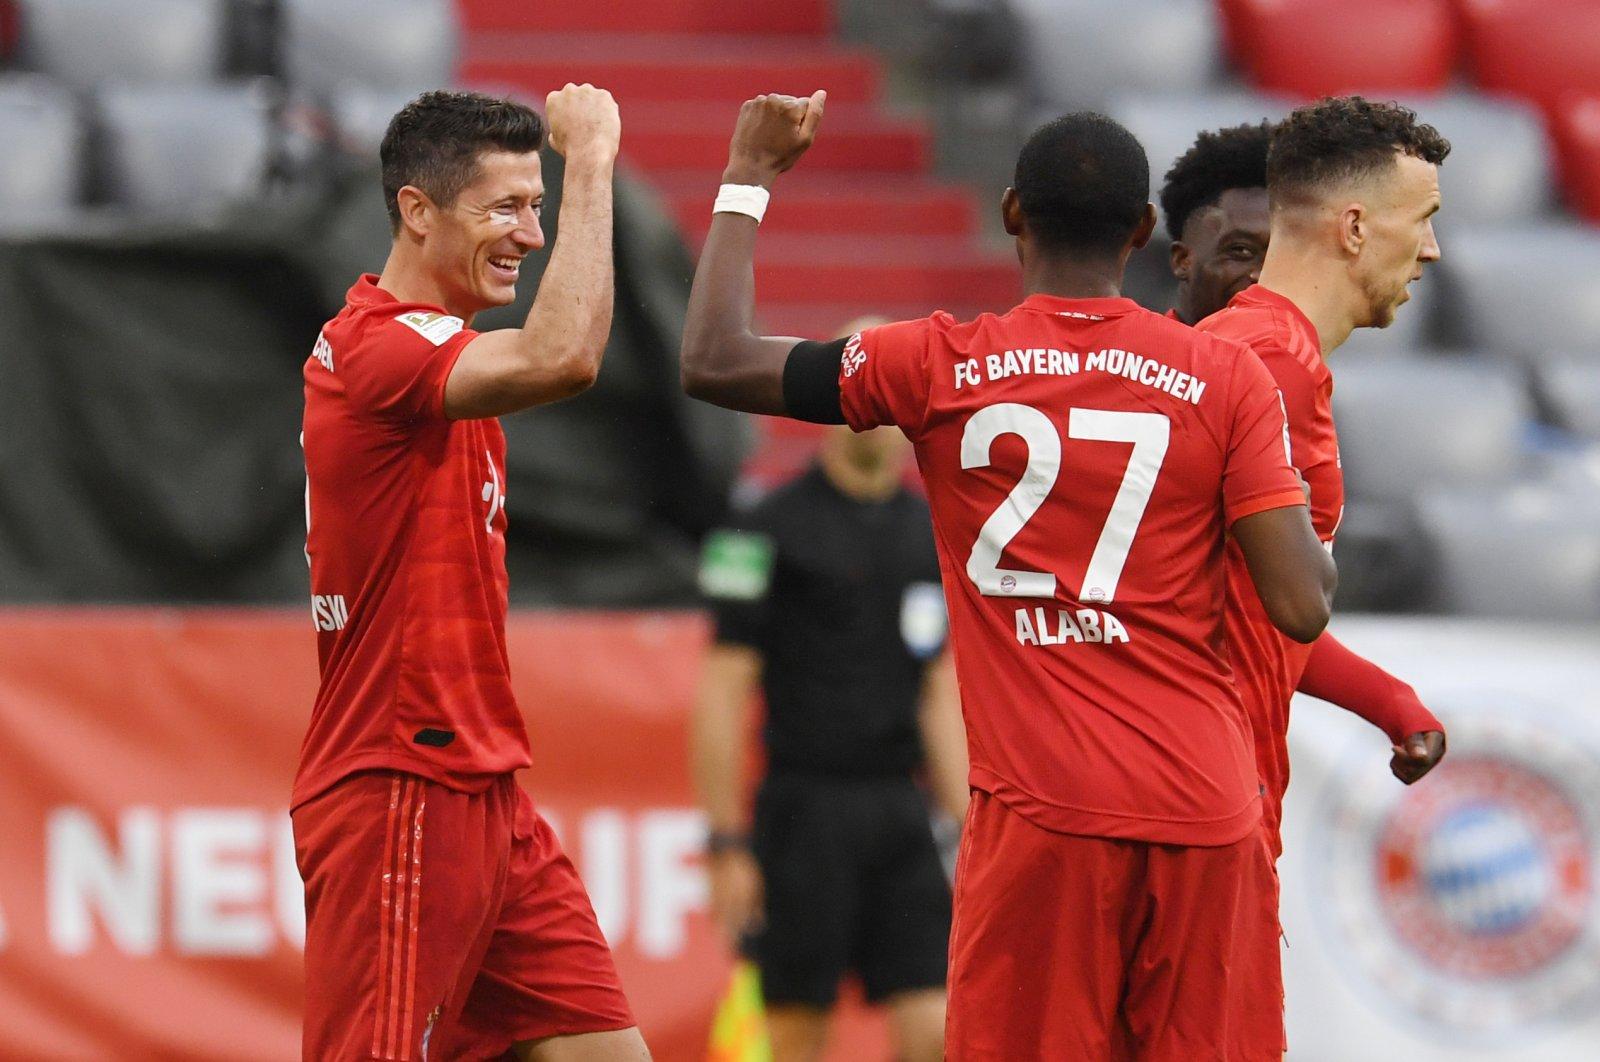 Bayern Munich's Polish forward Robert Lewandowski (L) celebrates scoring the third goal with Bayern Munich's Austrian defender David Alaba during their Bundesliga match against Eintracht Frankfurt, Munich, southern Germany, May 23, 2020.